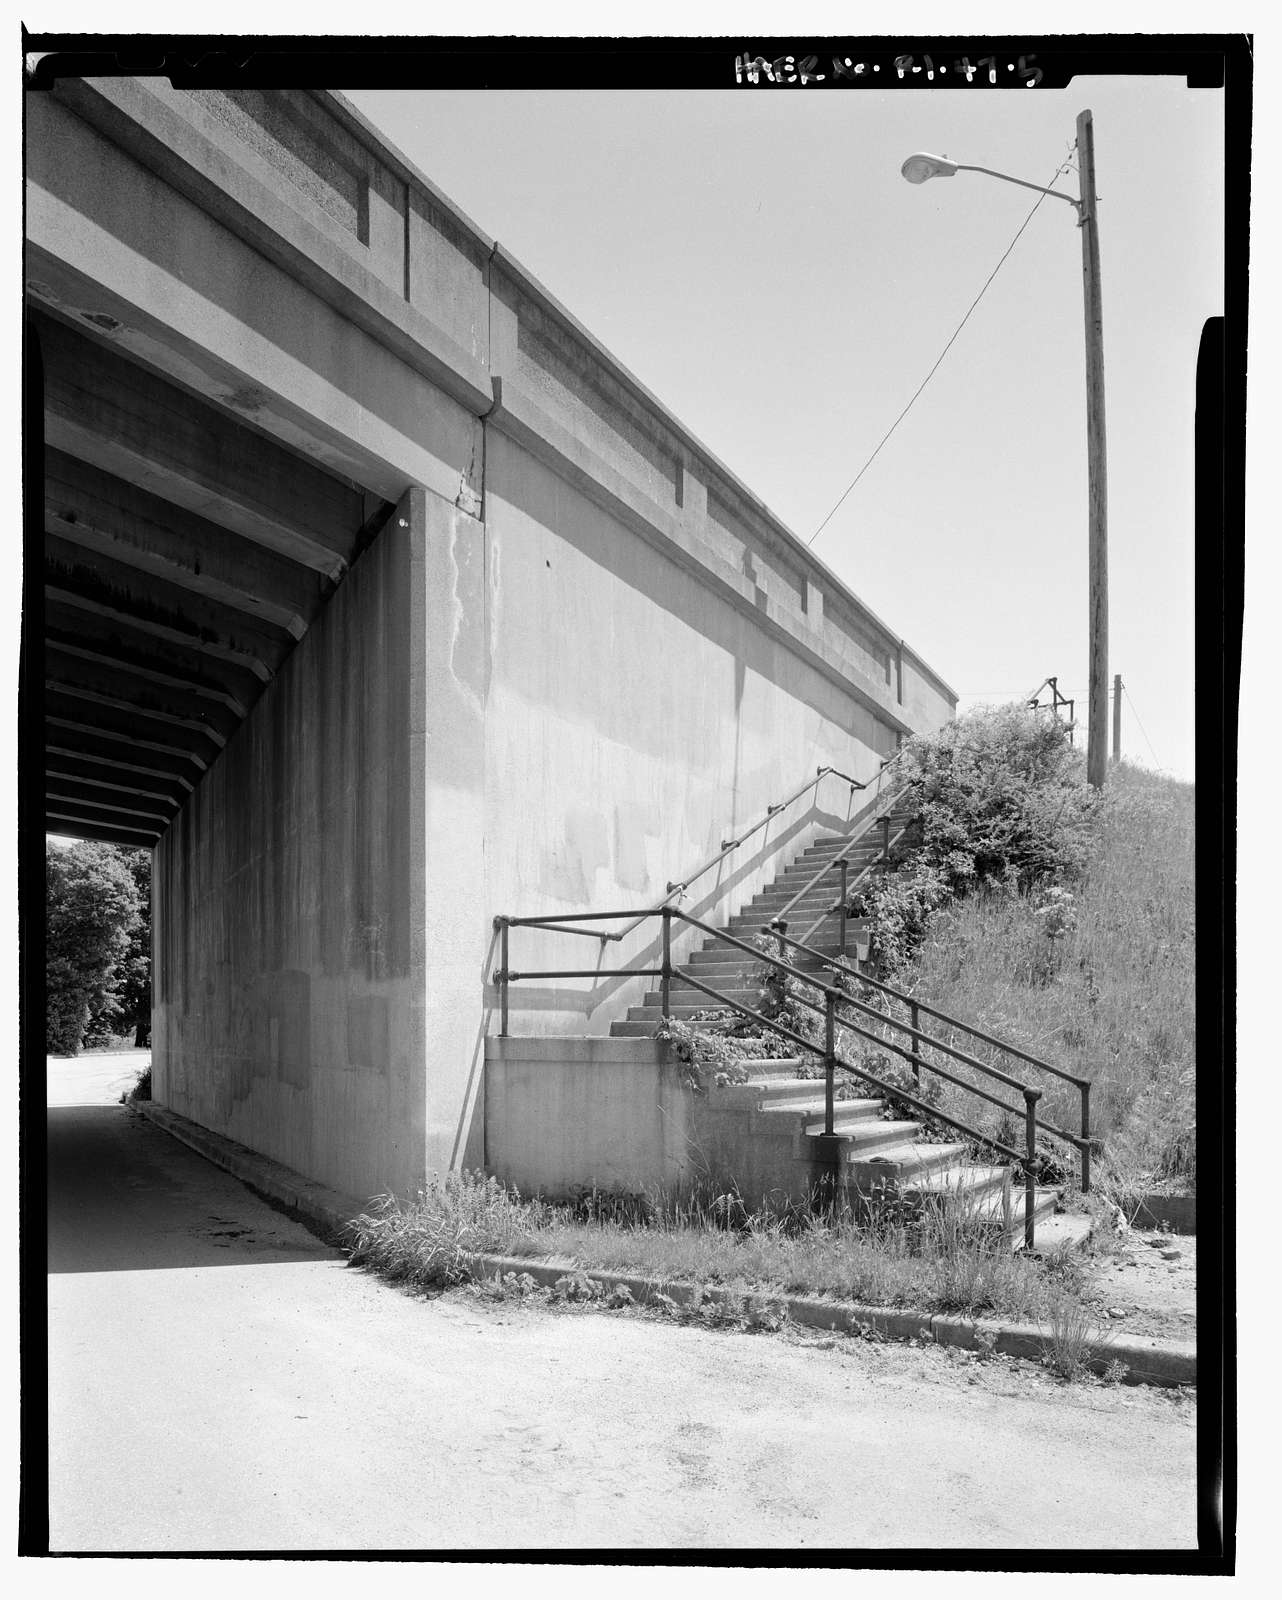 Main Street Bridge, Main Street (State Route 138) over New Haven Railroad, West Kingston, Washington County, RI